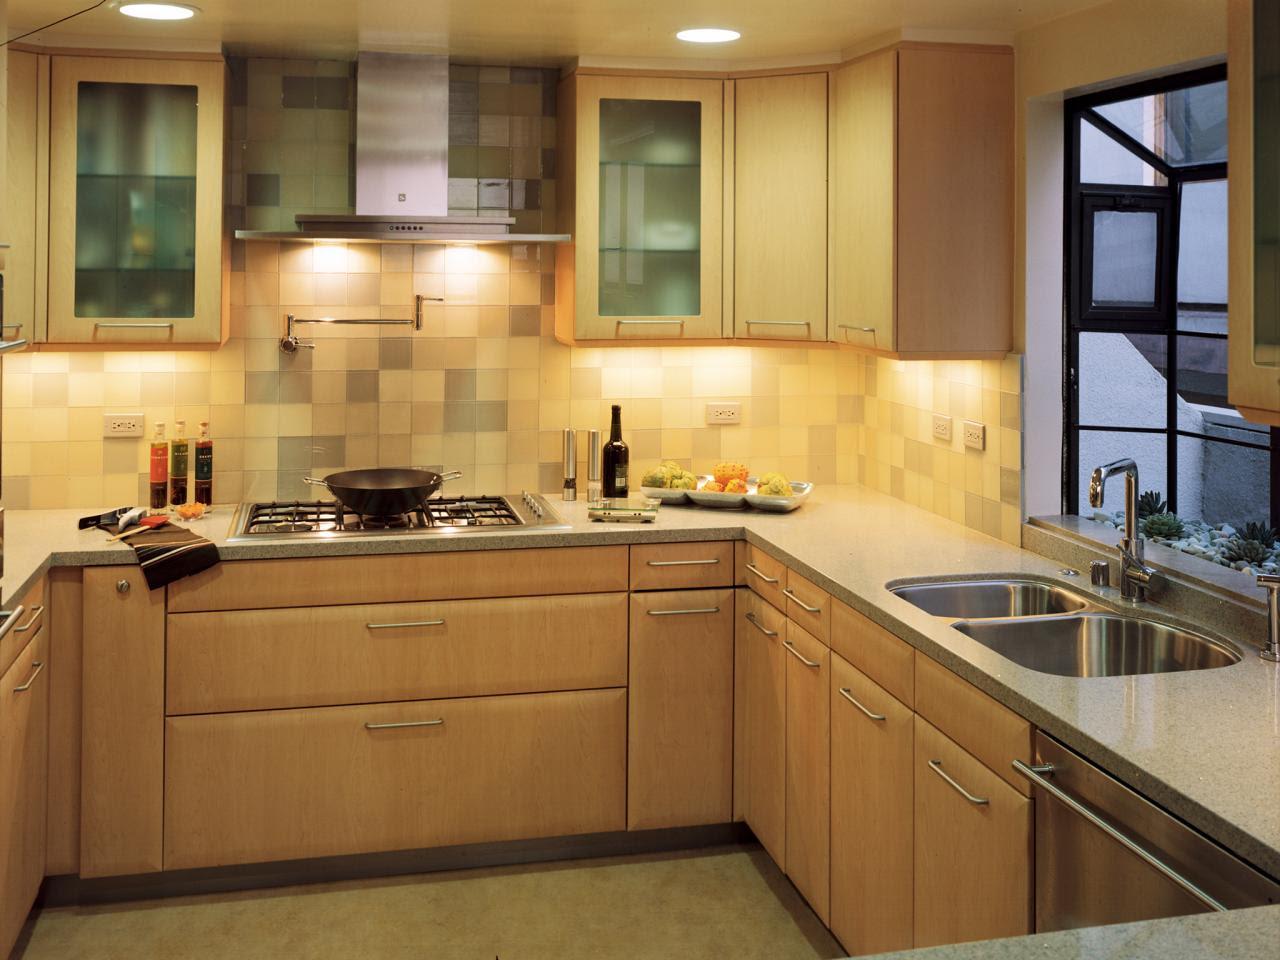 Kitchen Cabinet Door Accessories and Components: Pictures, Options ...